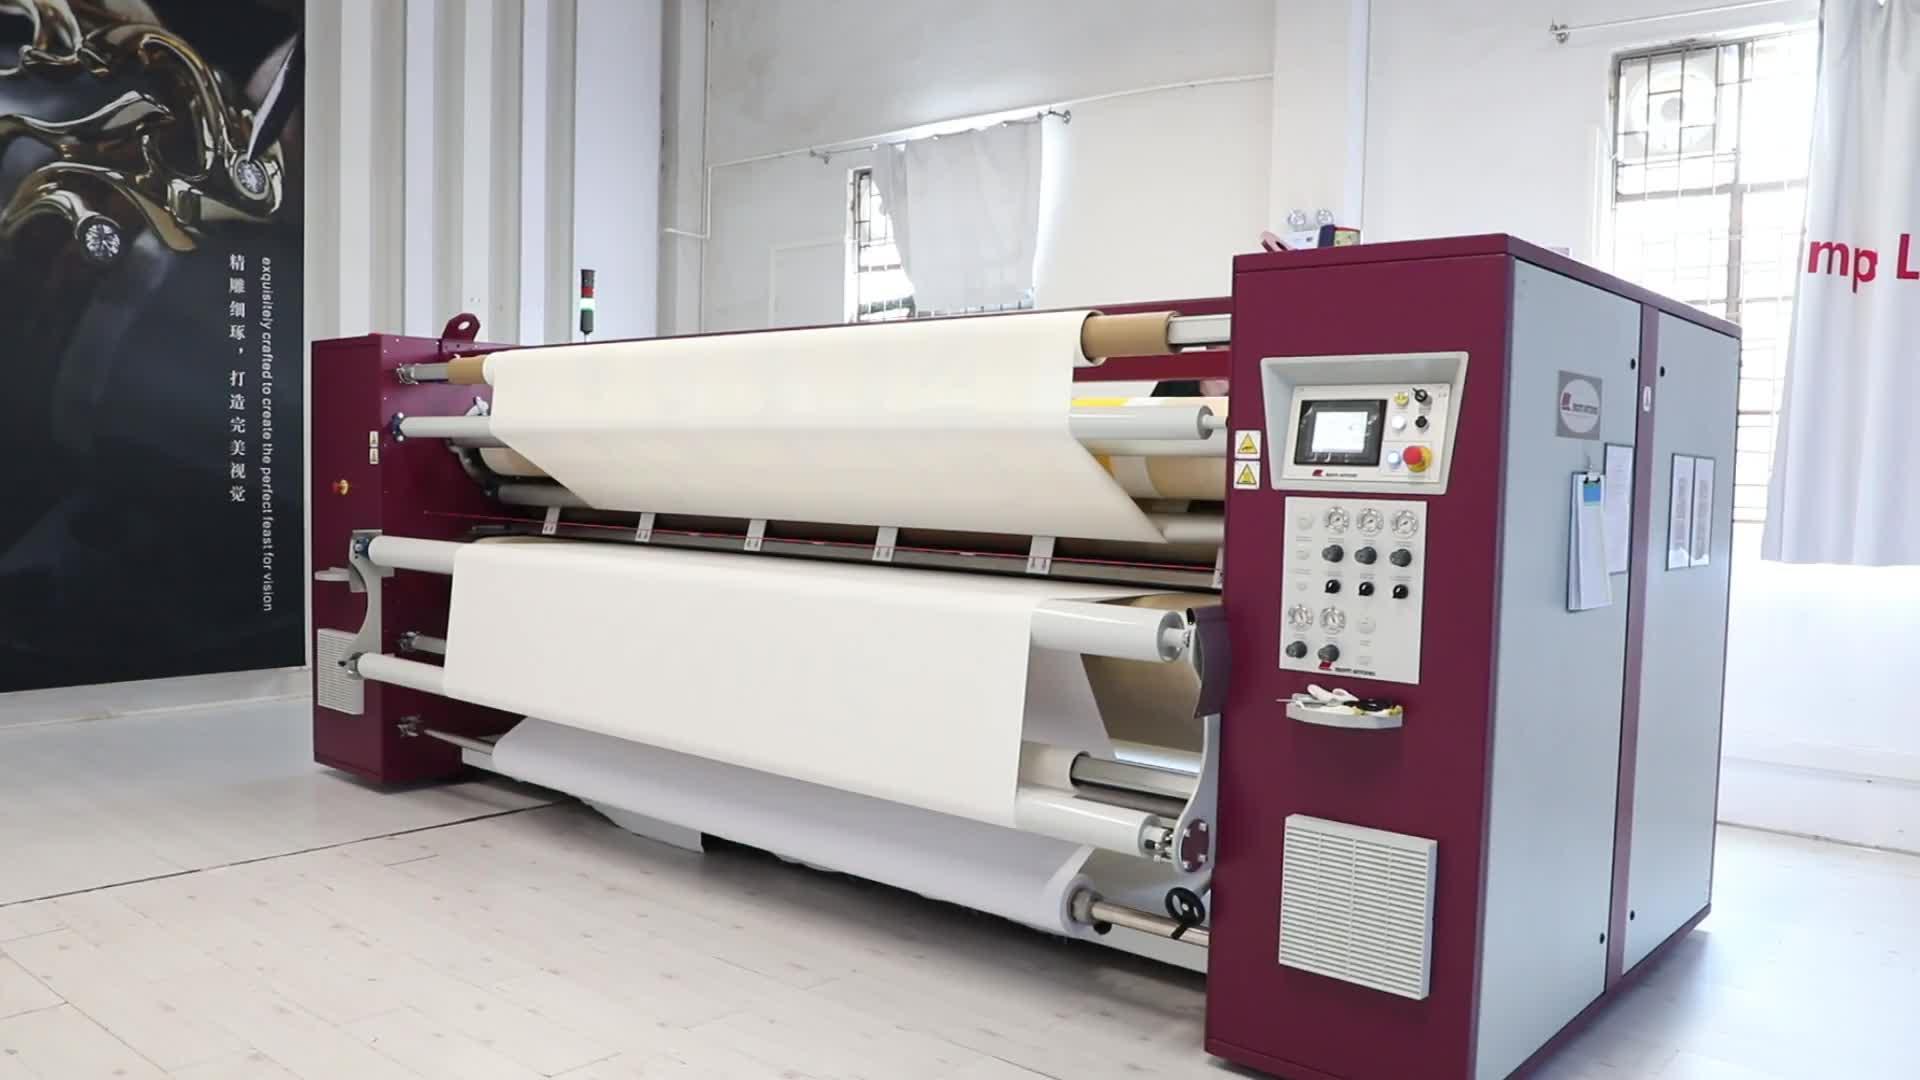 Digital printing sublimation/UV/LATEX printing woven backlit indoor advertisement light-box